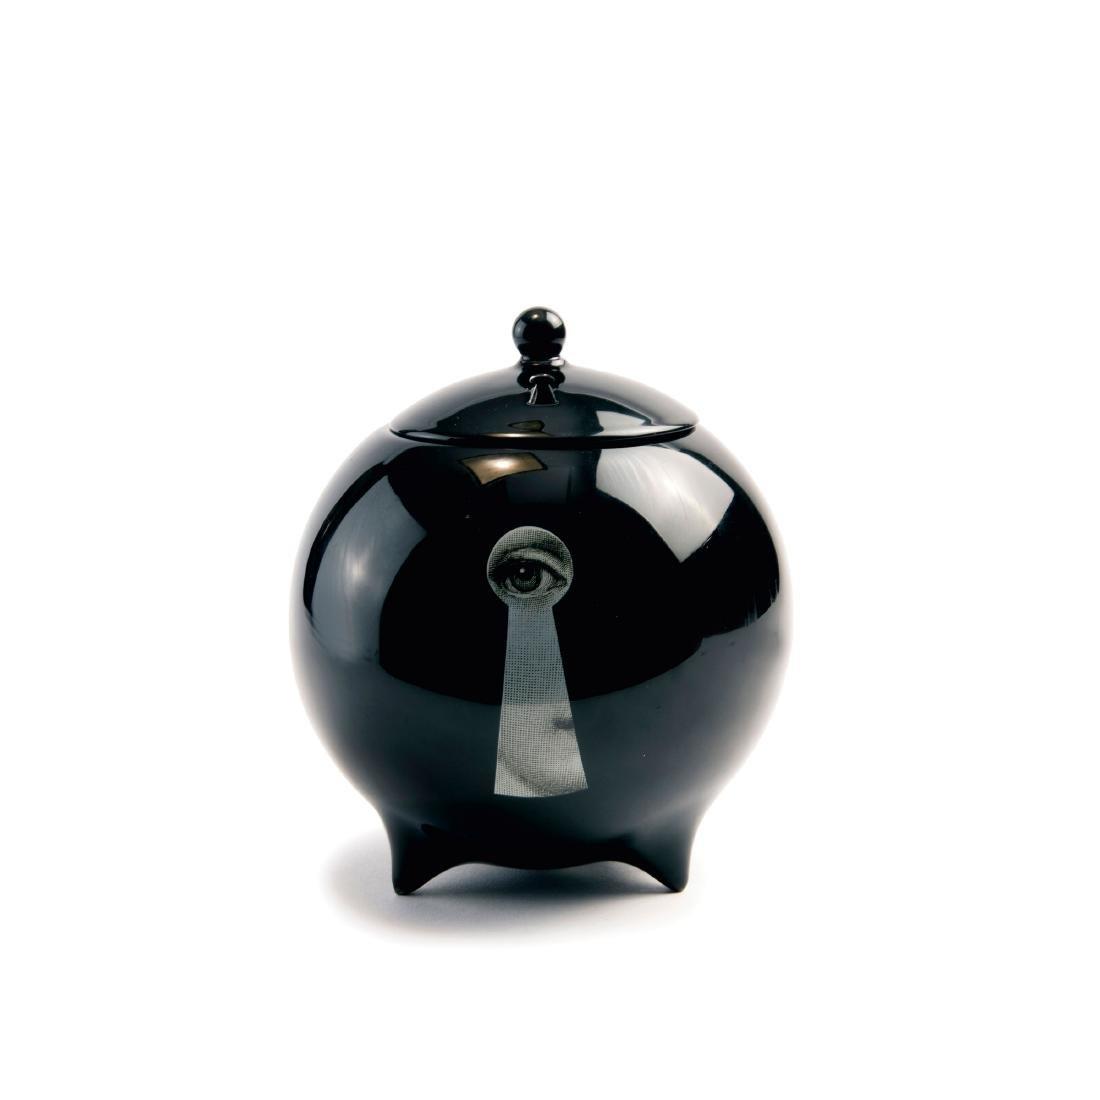 'La chiave' lampe Berger, 2000s